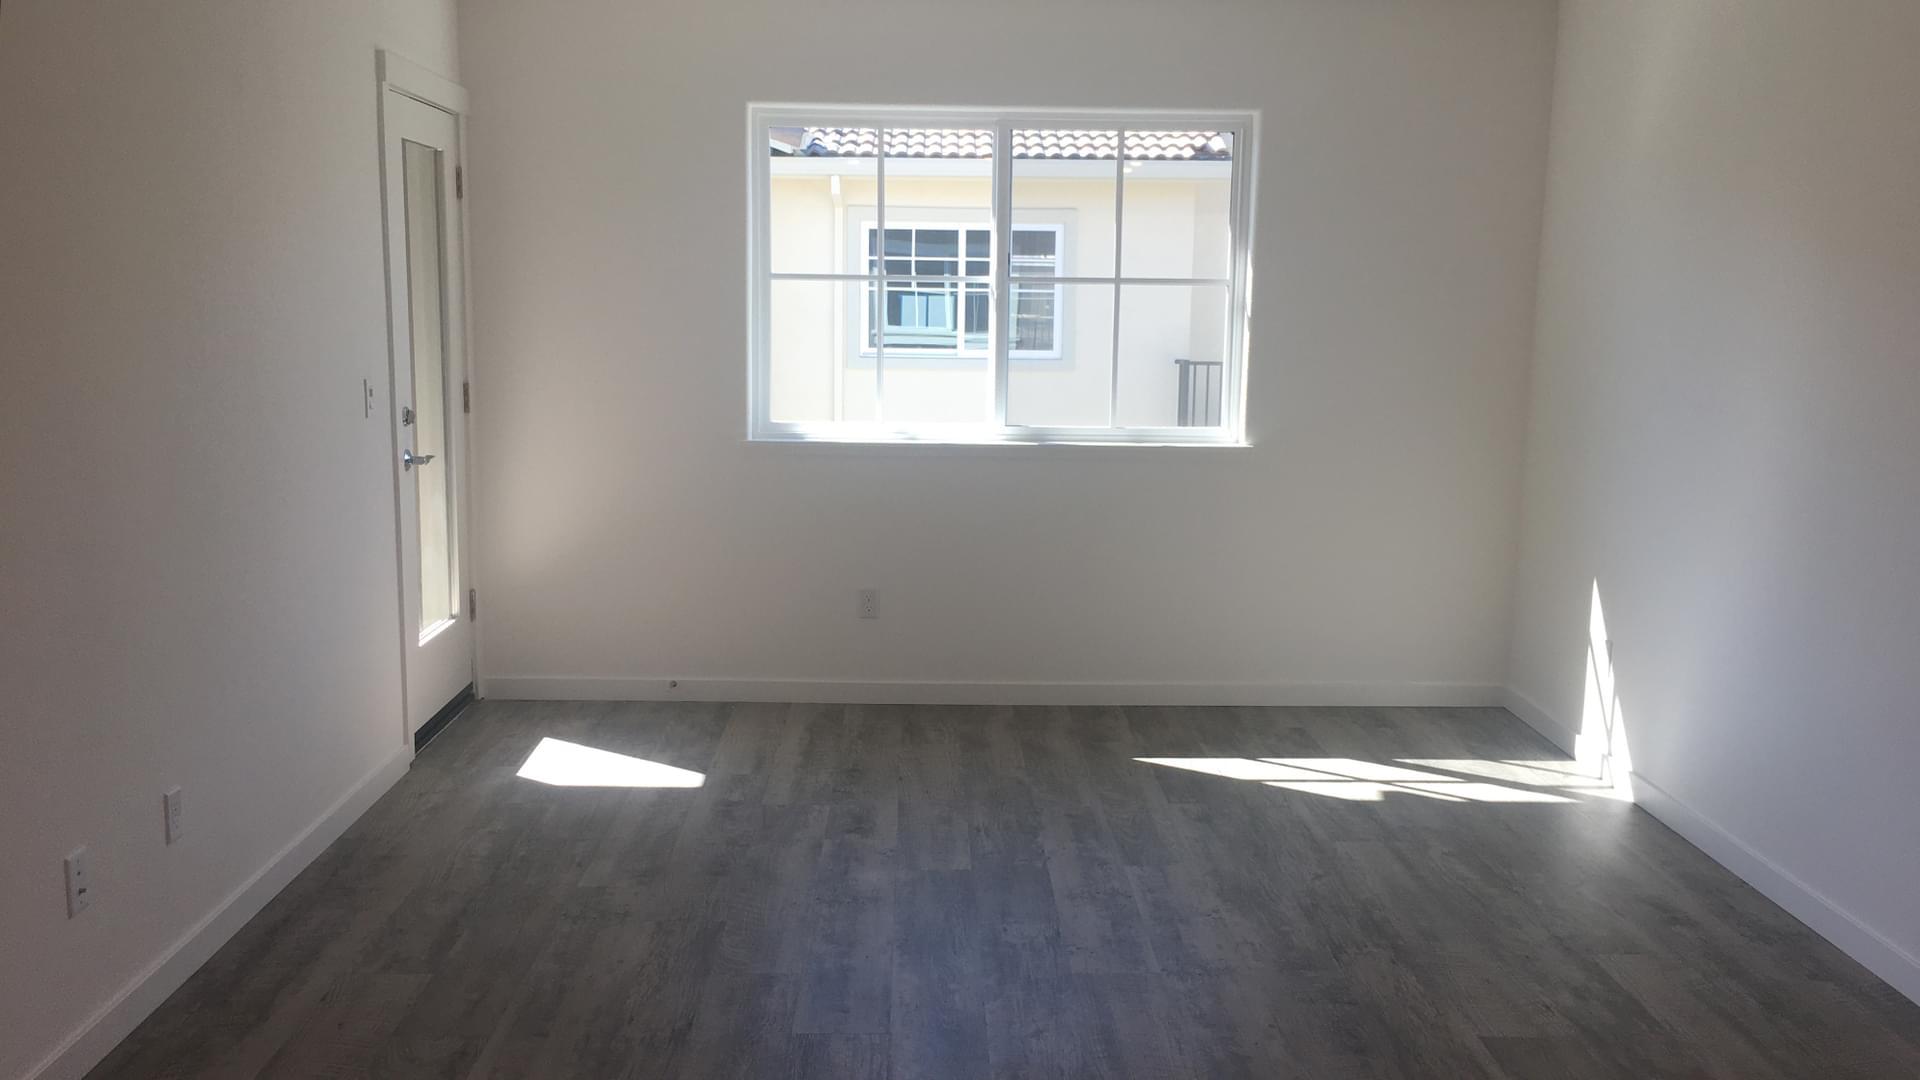 Unit 3302 Living Room